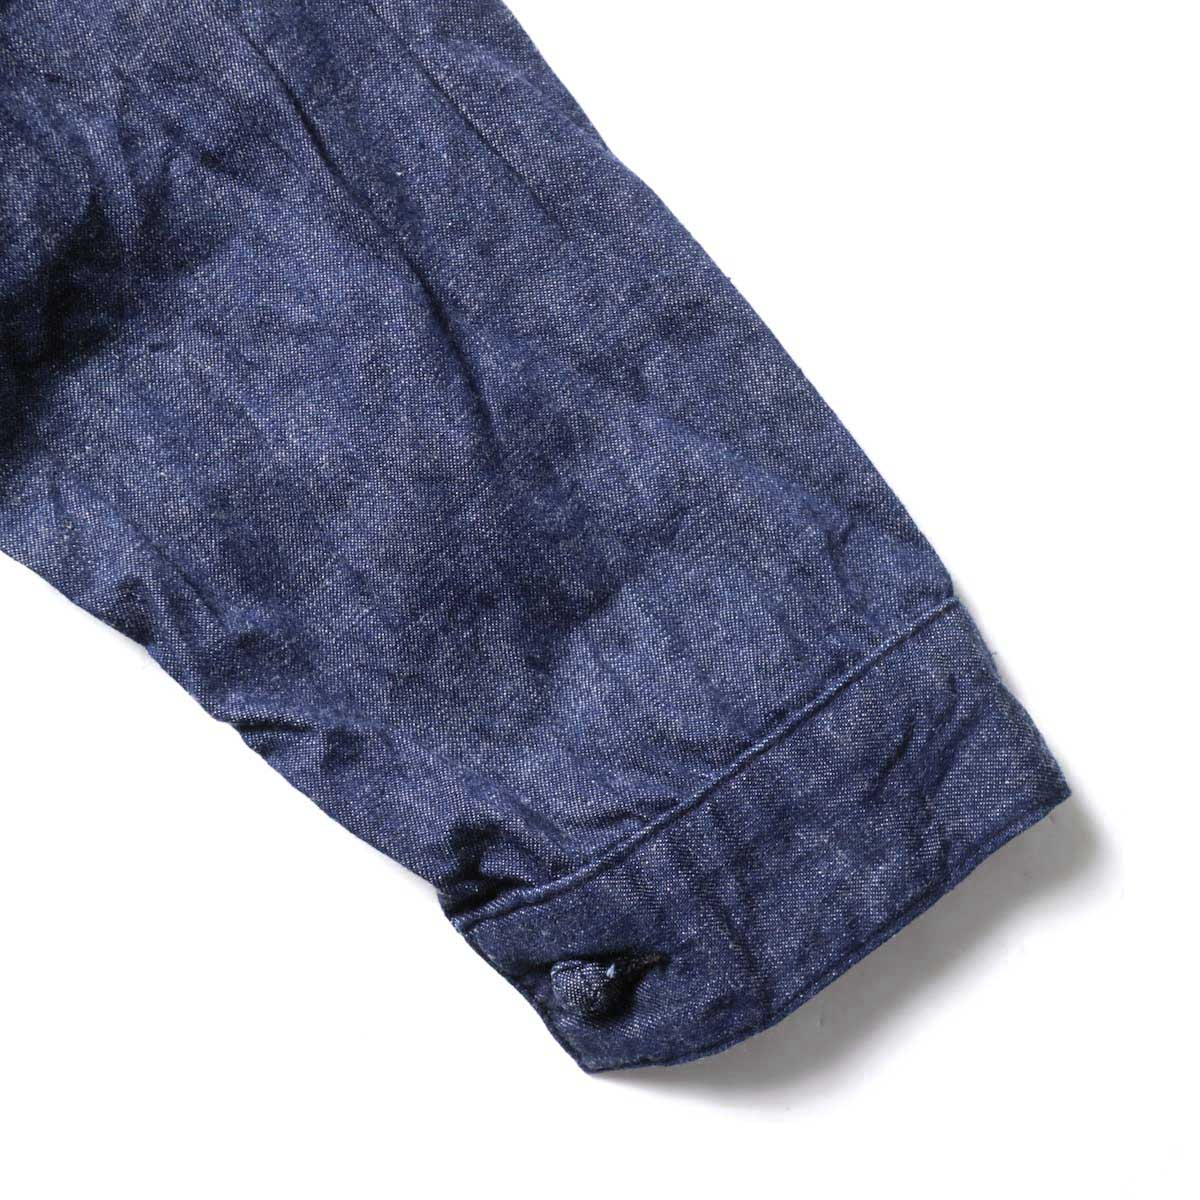 orSlow / Frog Button Denim Jacket (Indigo) 袖